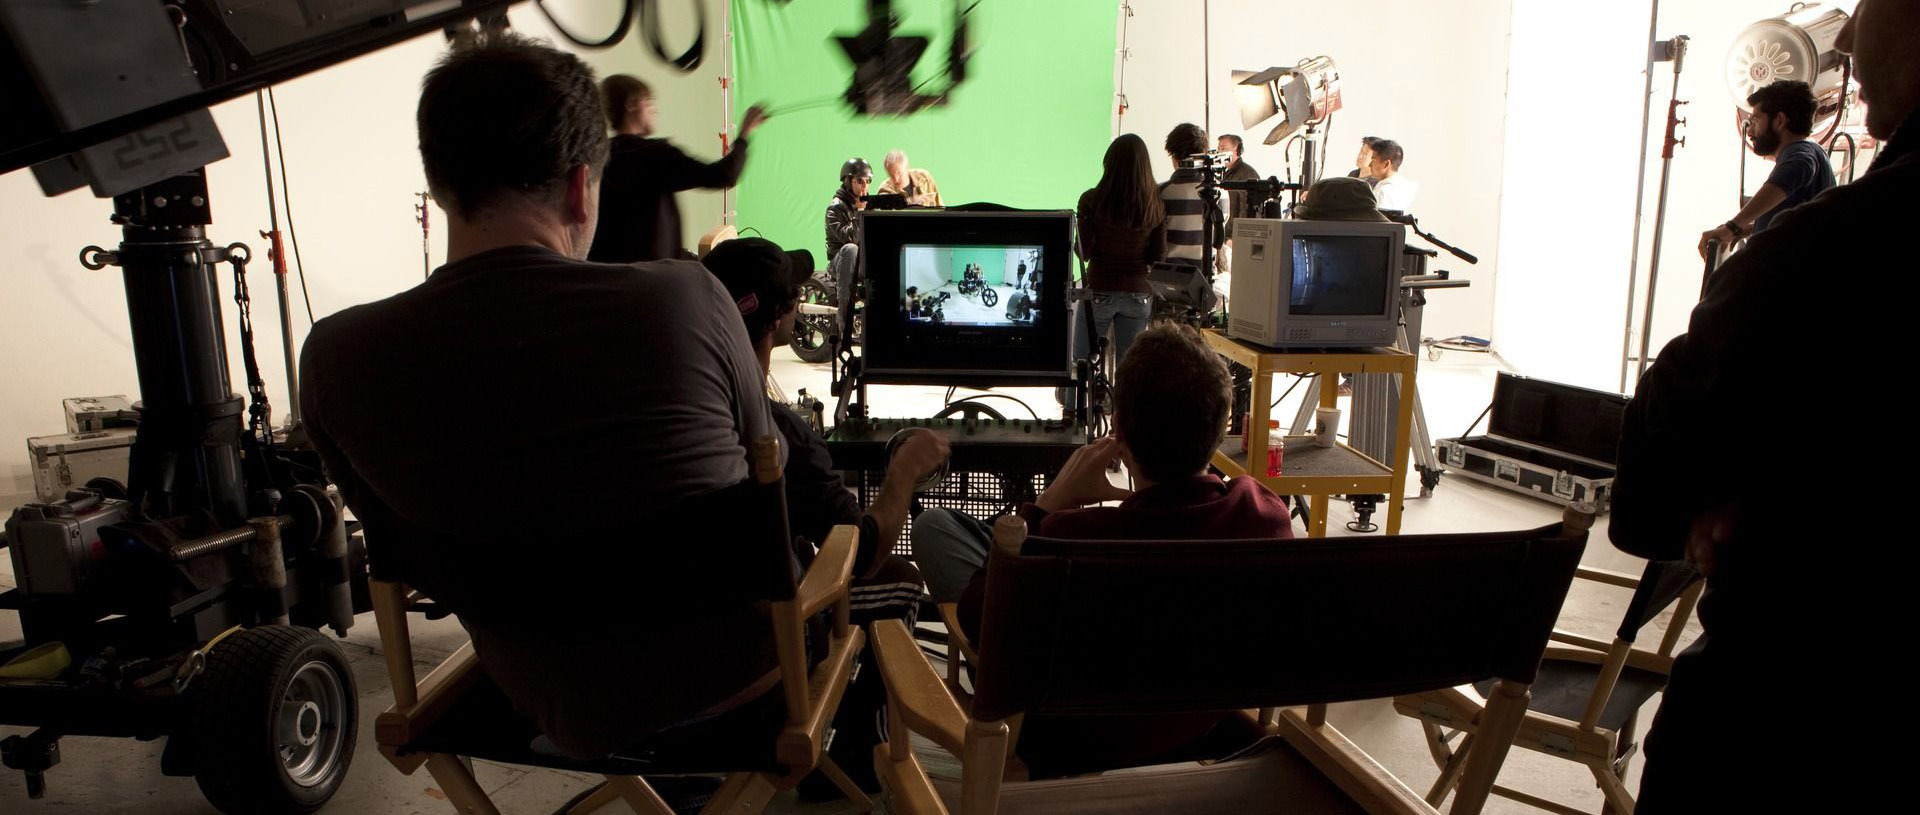 Film School: A Graduate's Perspective | robaylingfilm